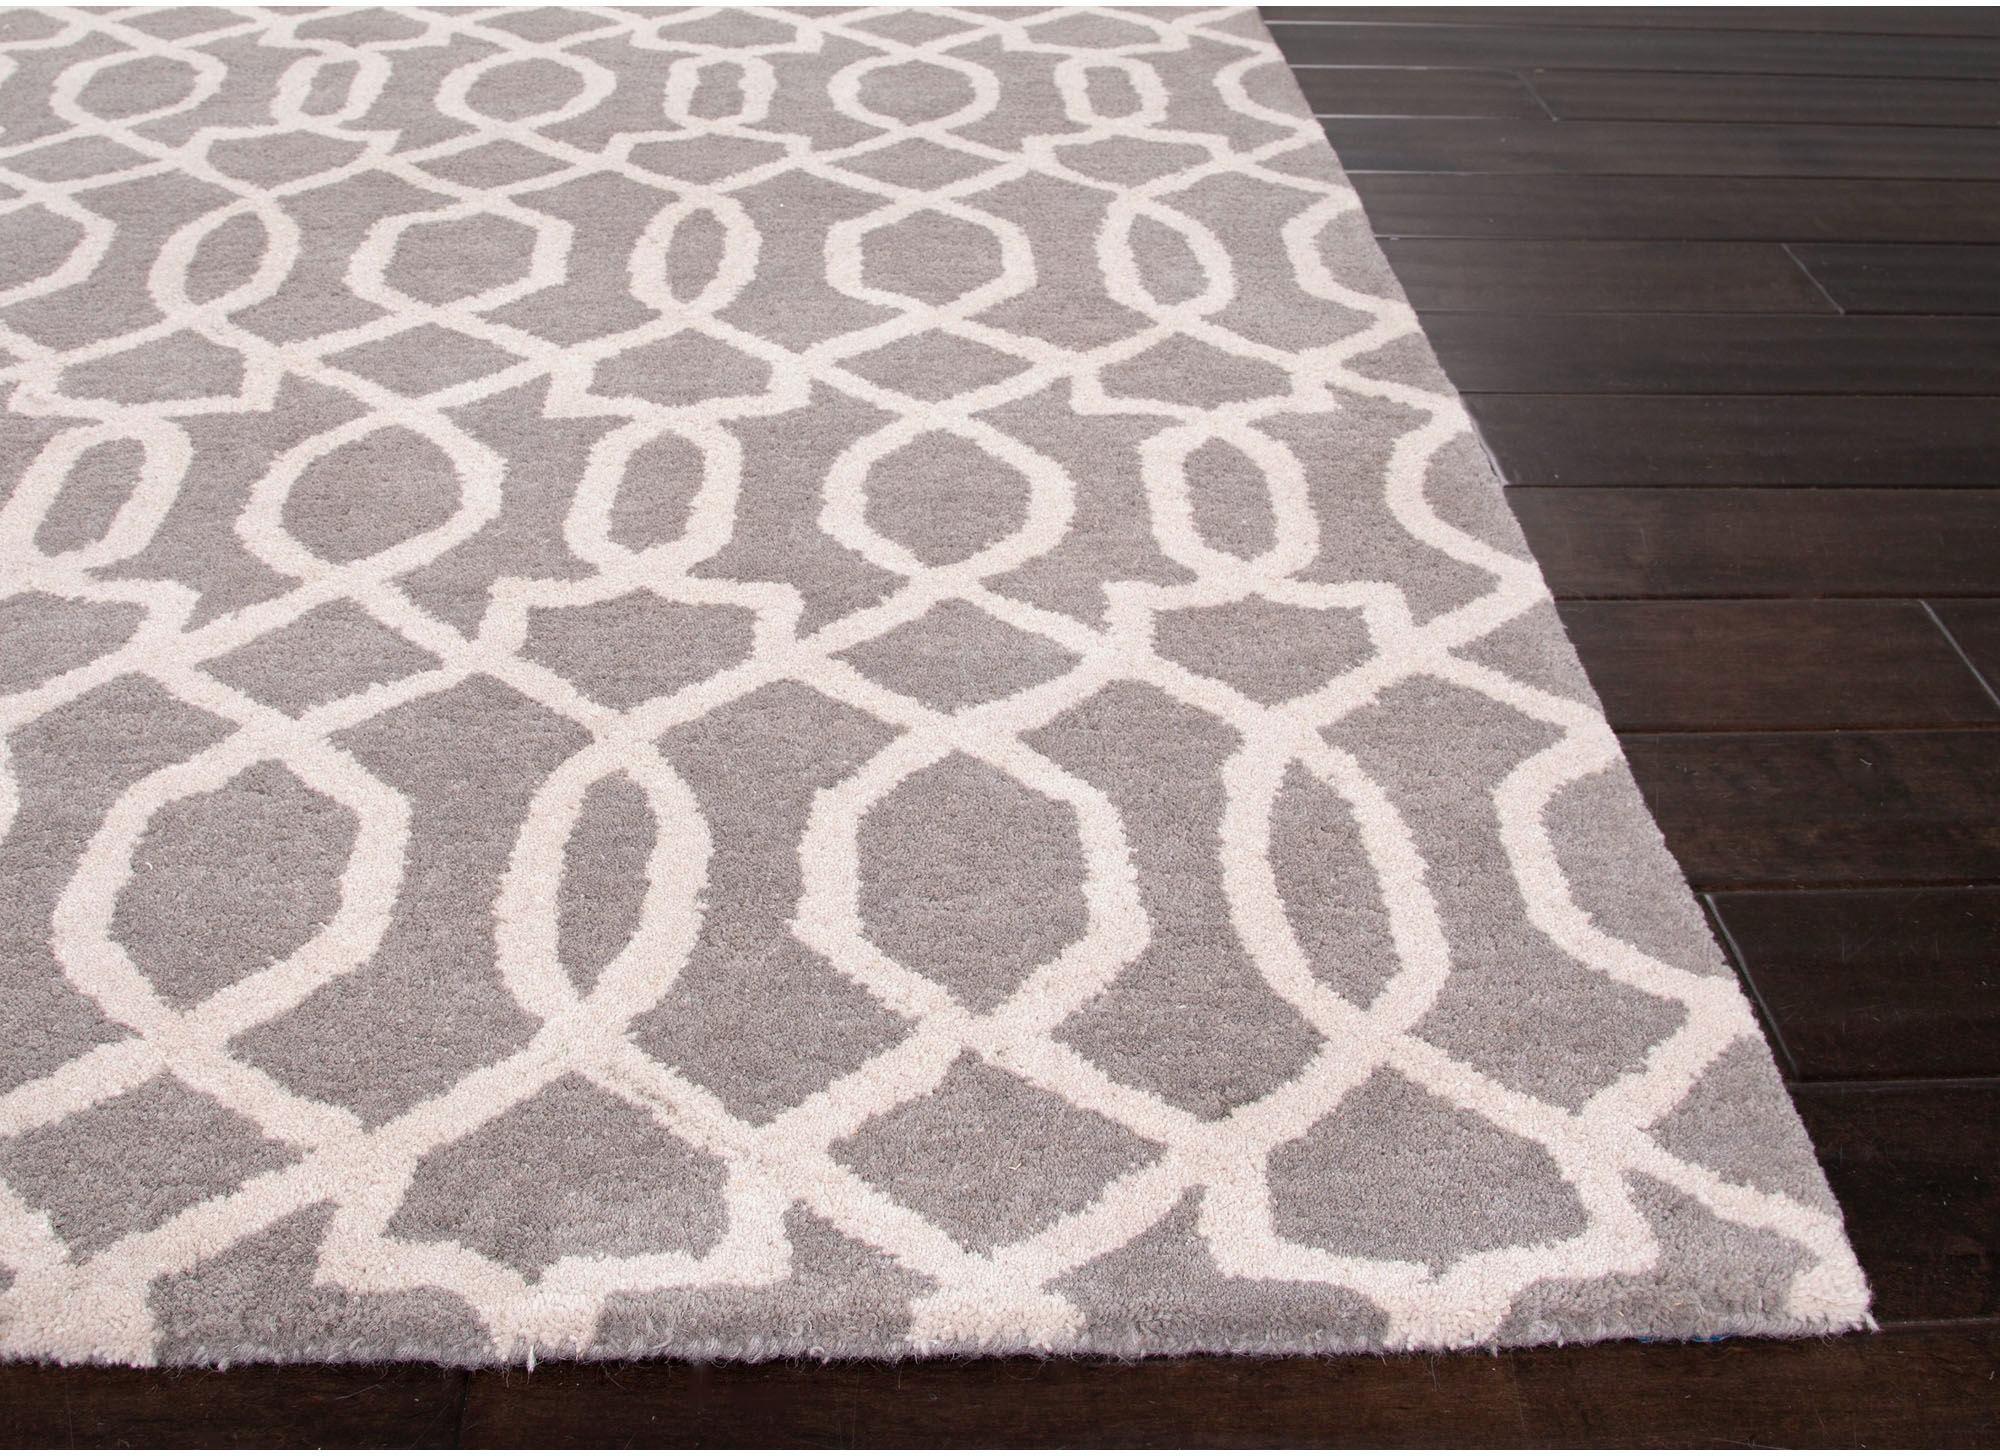 Jaipur Rugs Floor Coverings Hand Tufted Textured Wool Gray Ivory